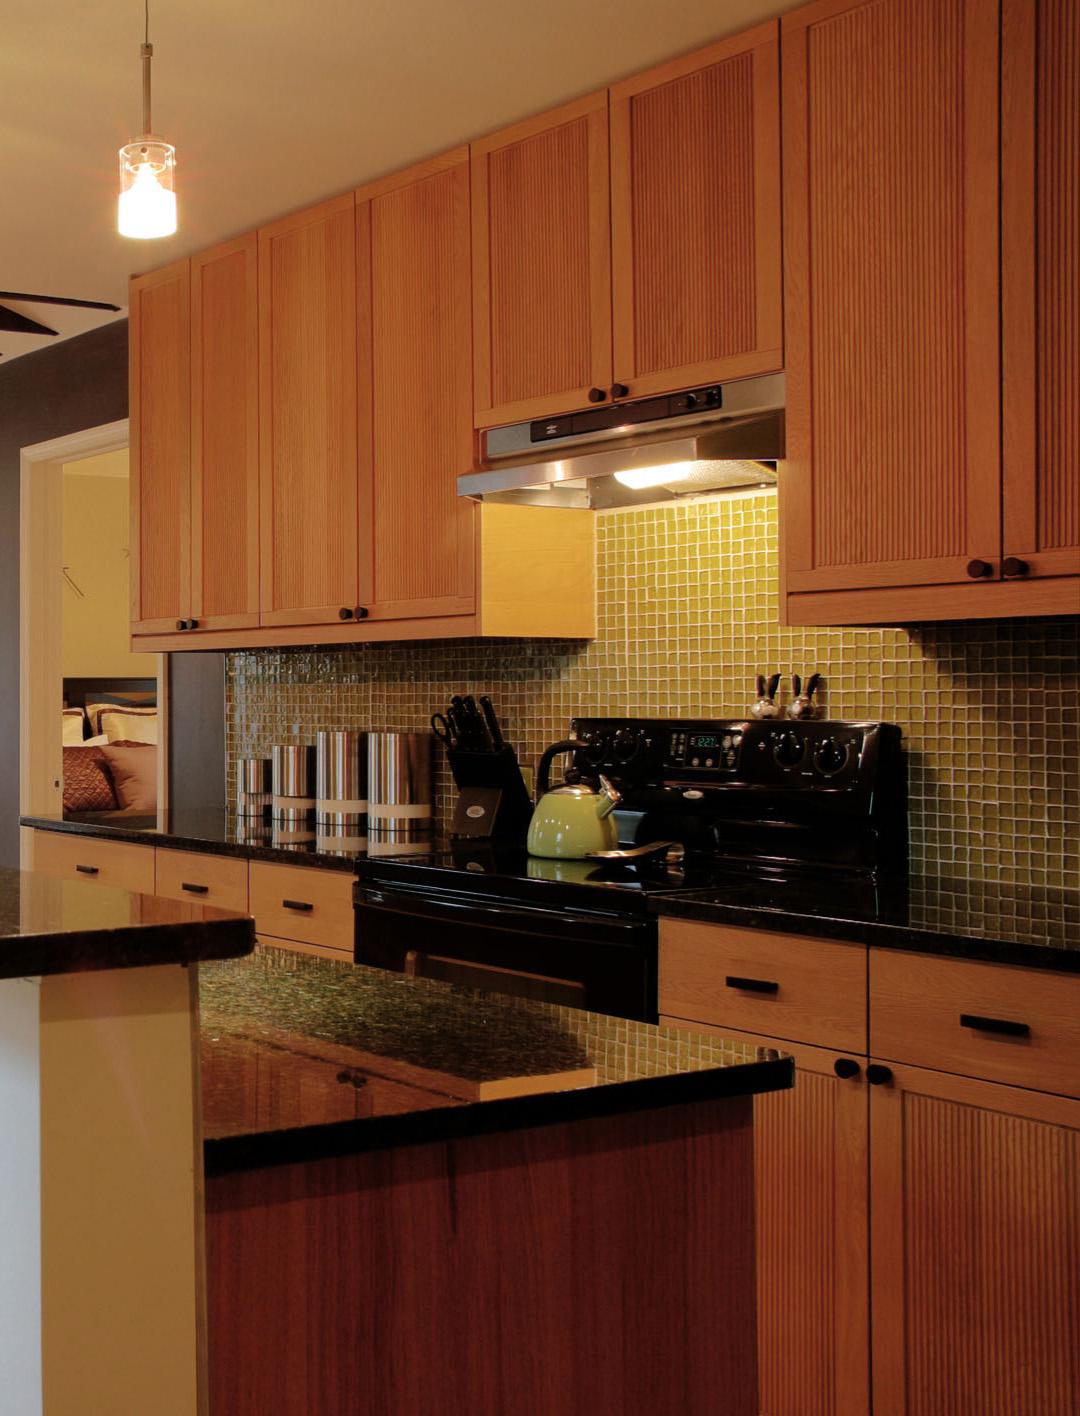 truth about ikea kitchen cabinets kitchen cabinet reviews The Truth about Ikea Kitchen Cabinets